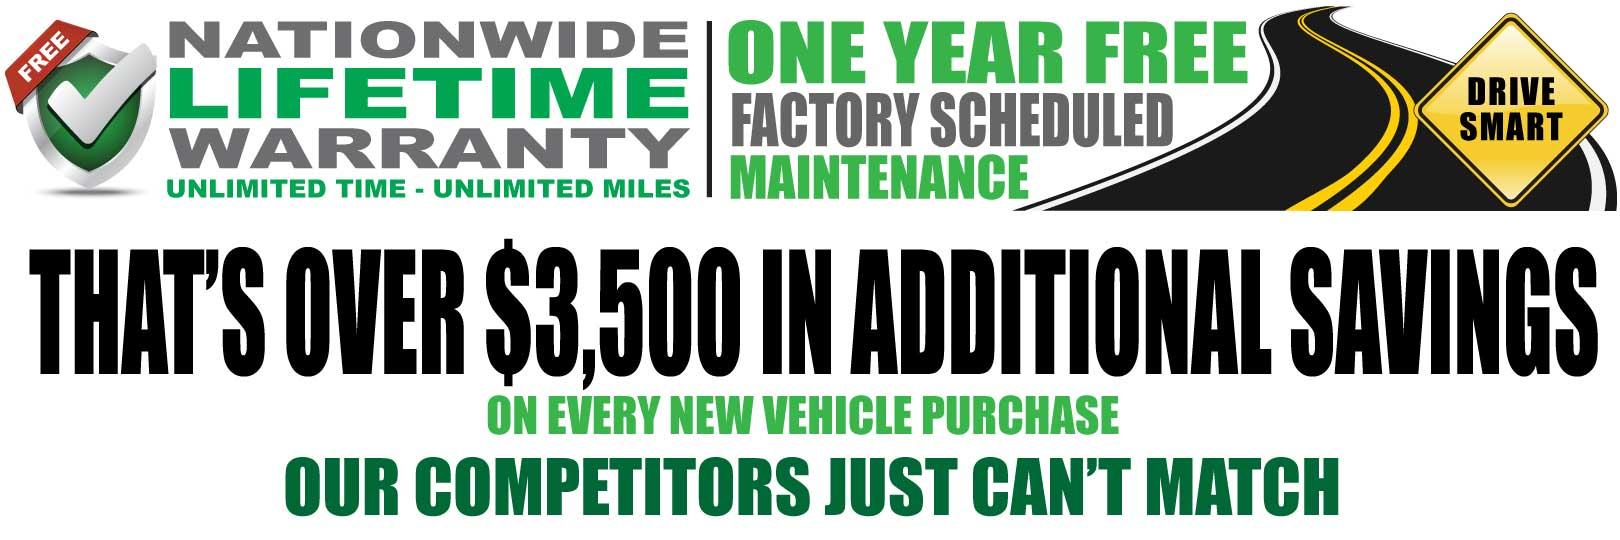 Lakeland Ford Nationwide Lifetime Warranty Lakeland Fl